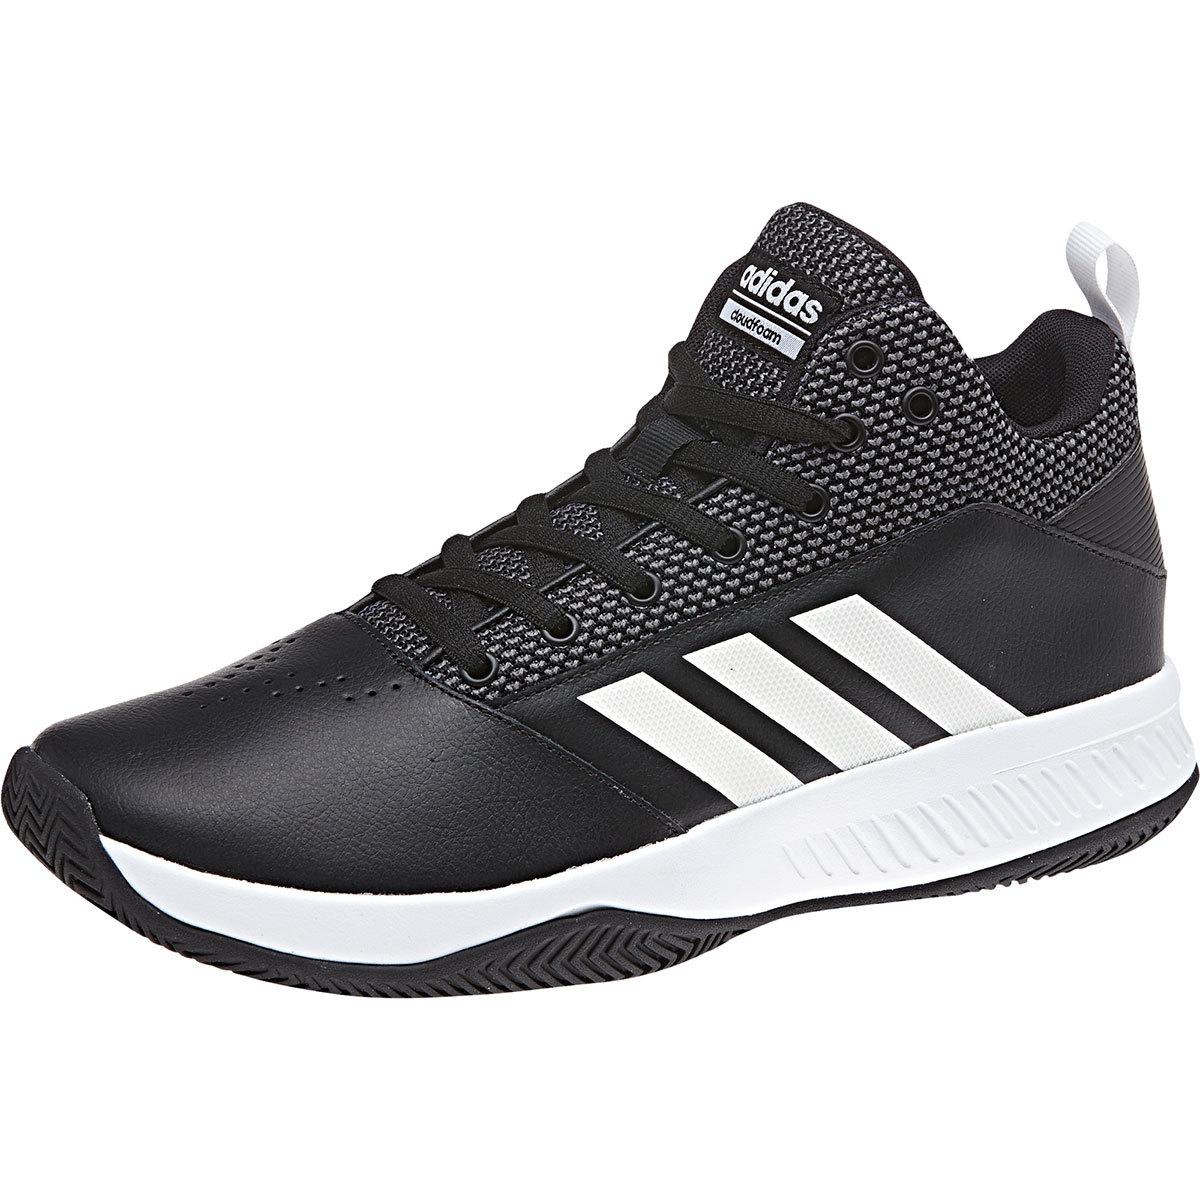 ADIDAS Men's Cloudfoam Ilation 2.0 Basketball Shoes, Wide